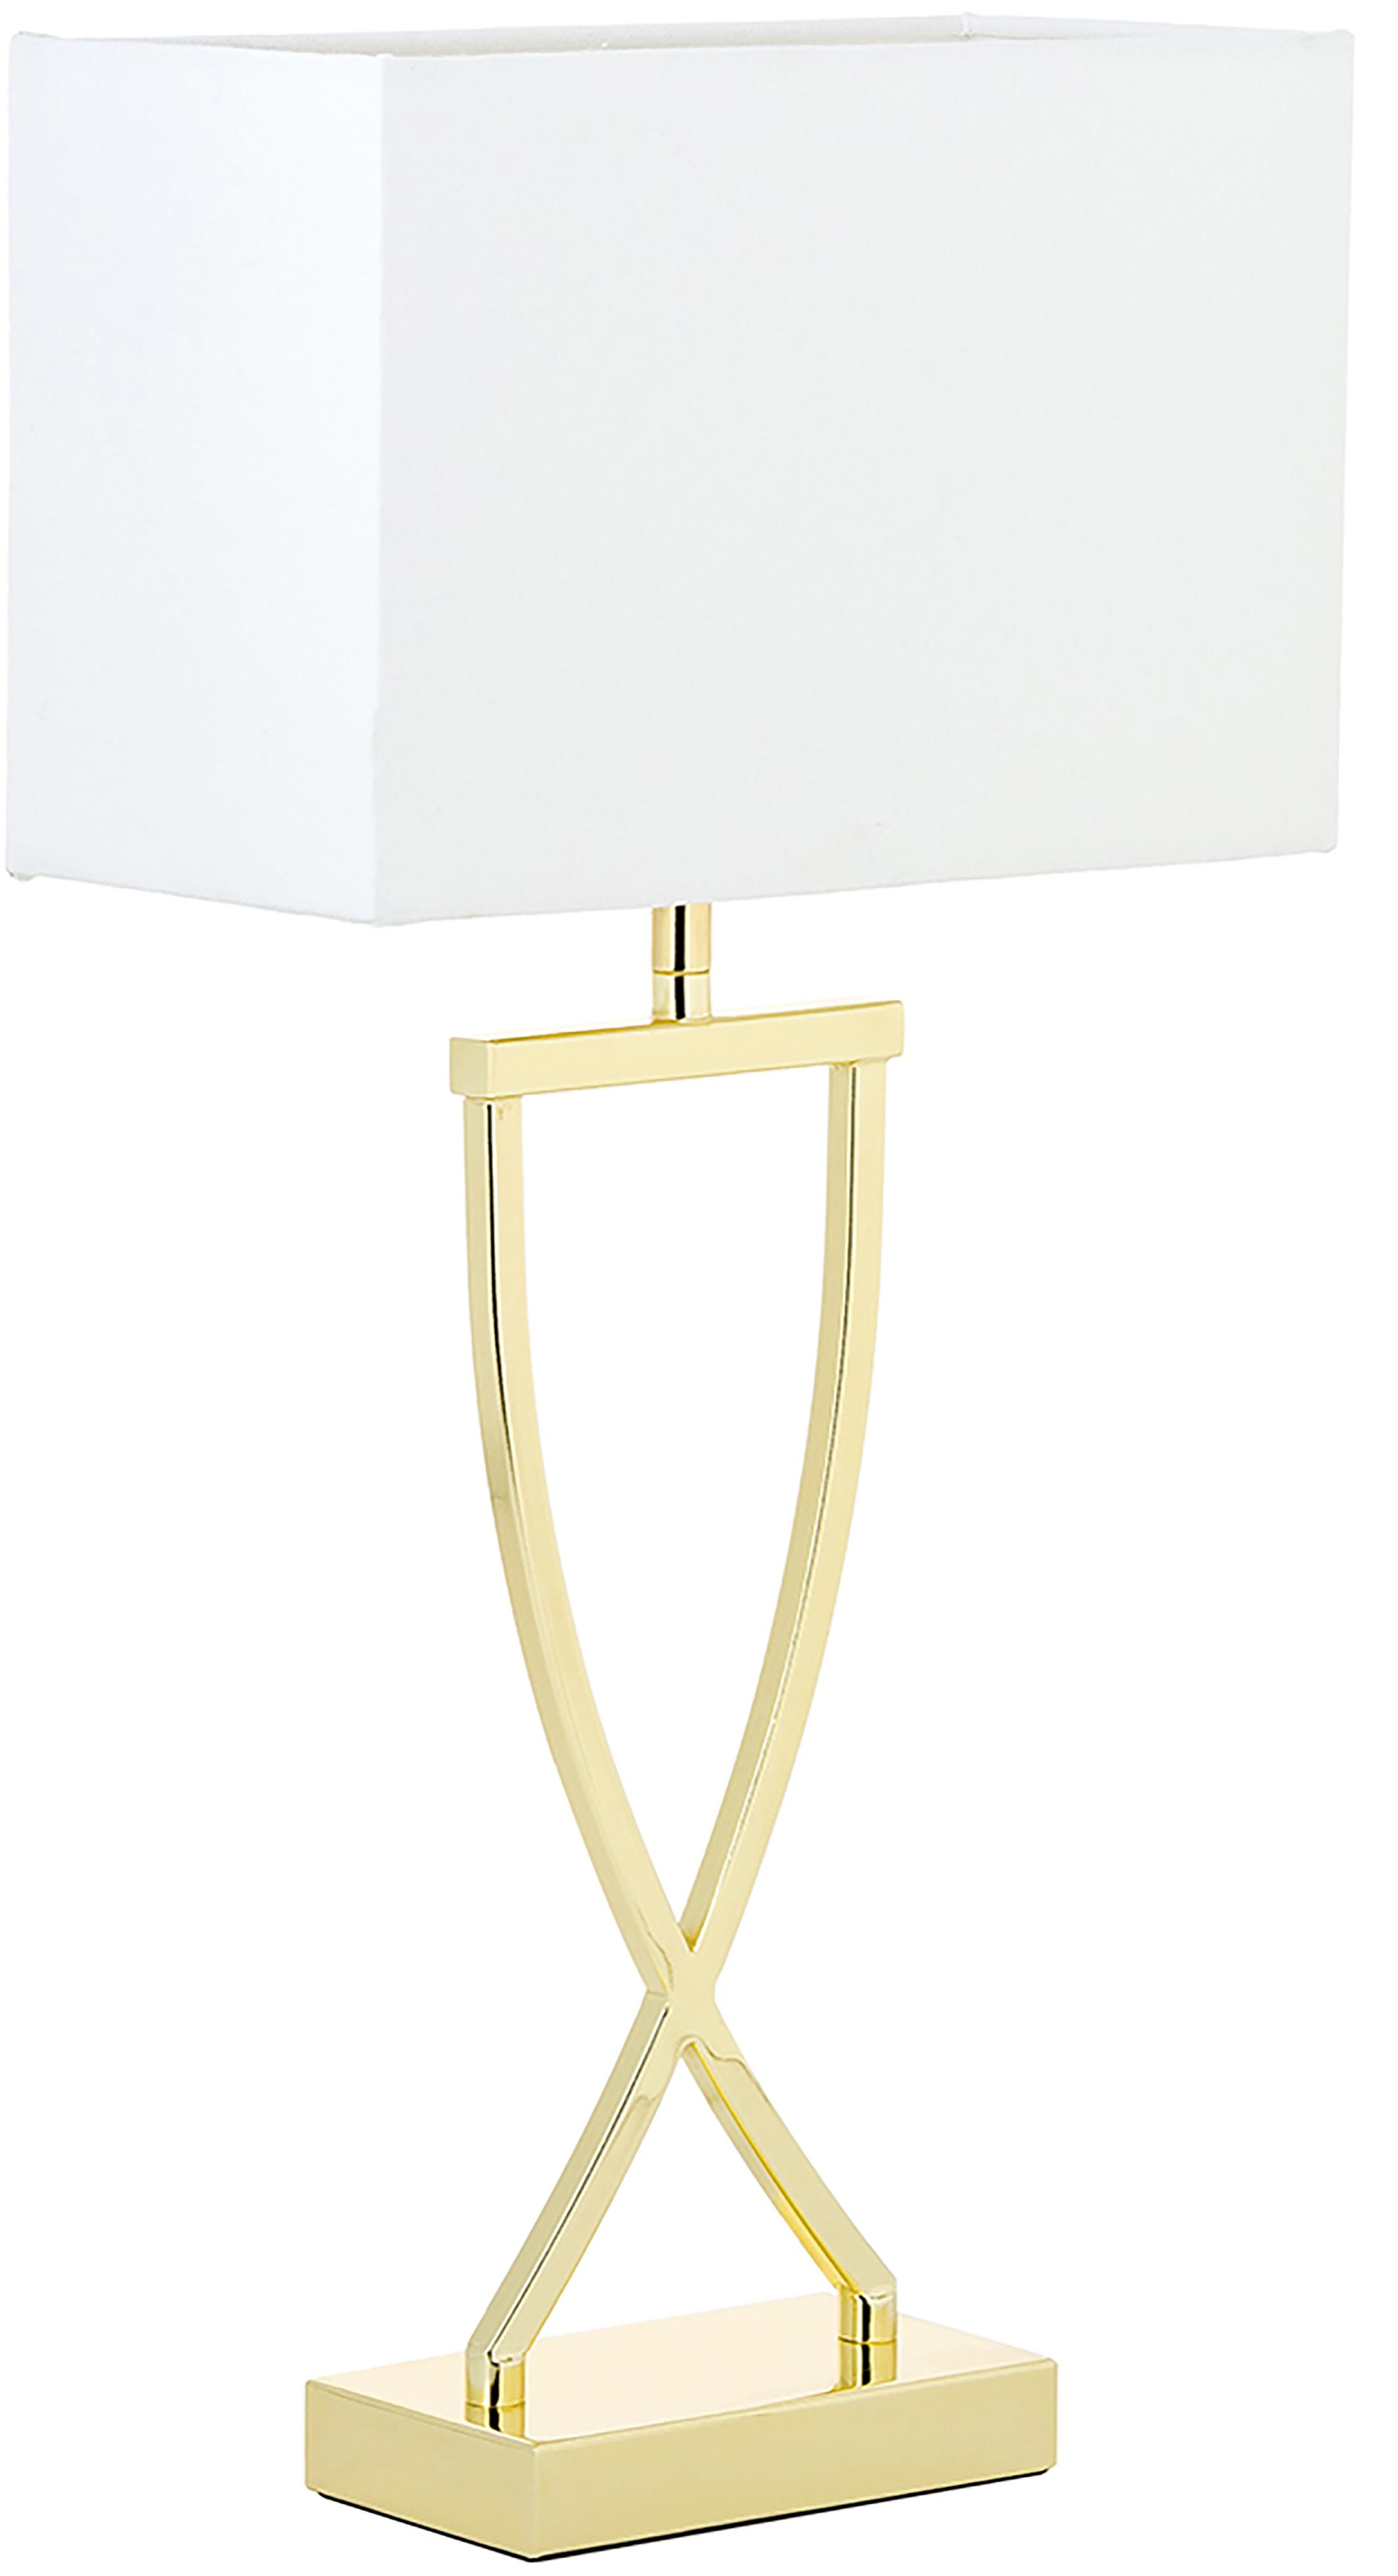 Klassische Tischlampe Vanessa, Lampenfuß: Metall, Lampenschirm: Textil, Goldfarben, 27 x 52 cm